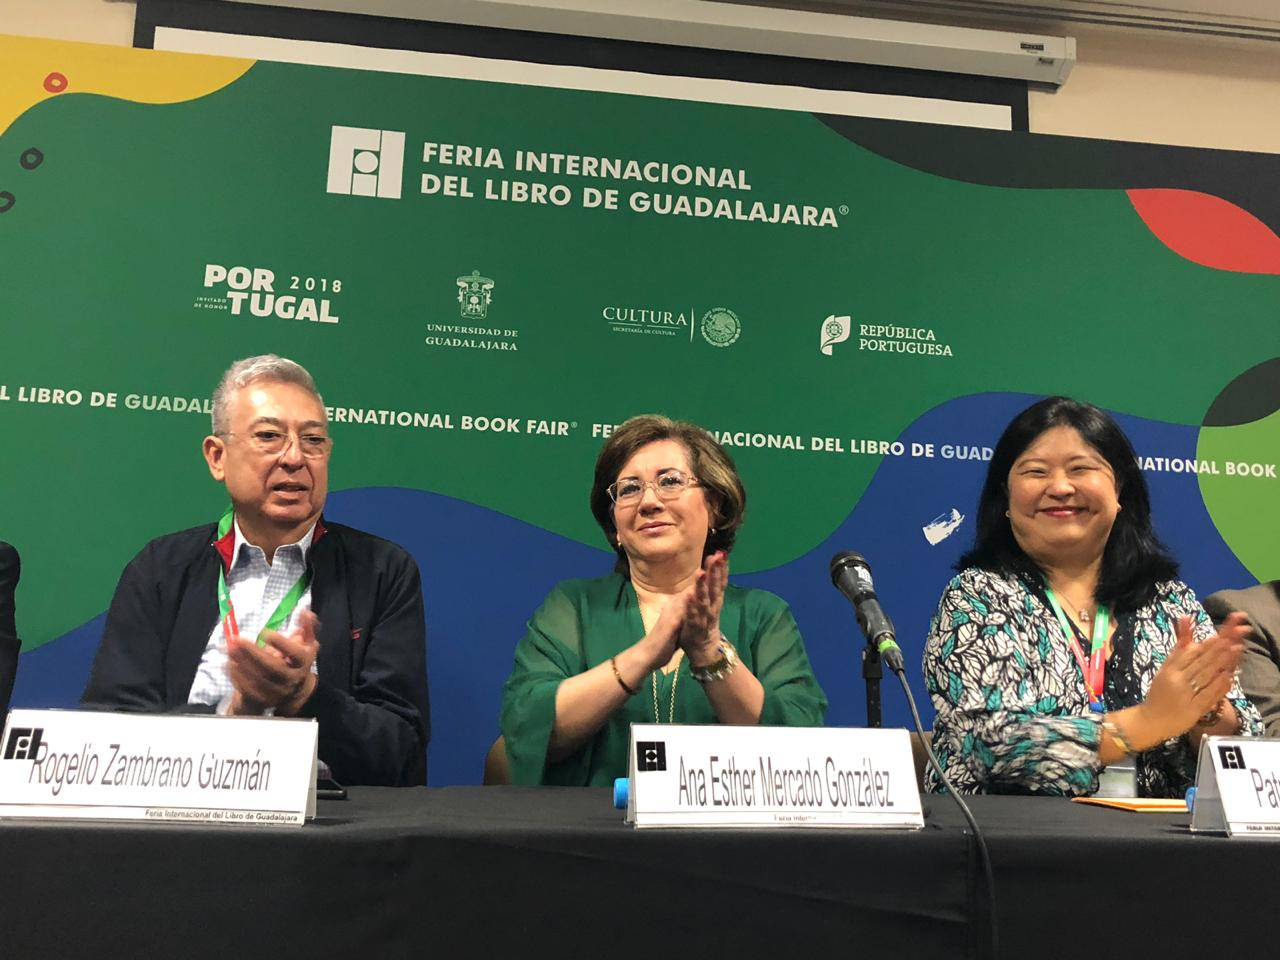 Dr Rogelio Zambrano, Dra Mercado y Lic. Yokogawa aplaudiendo